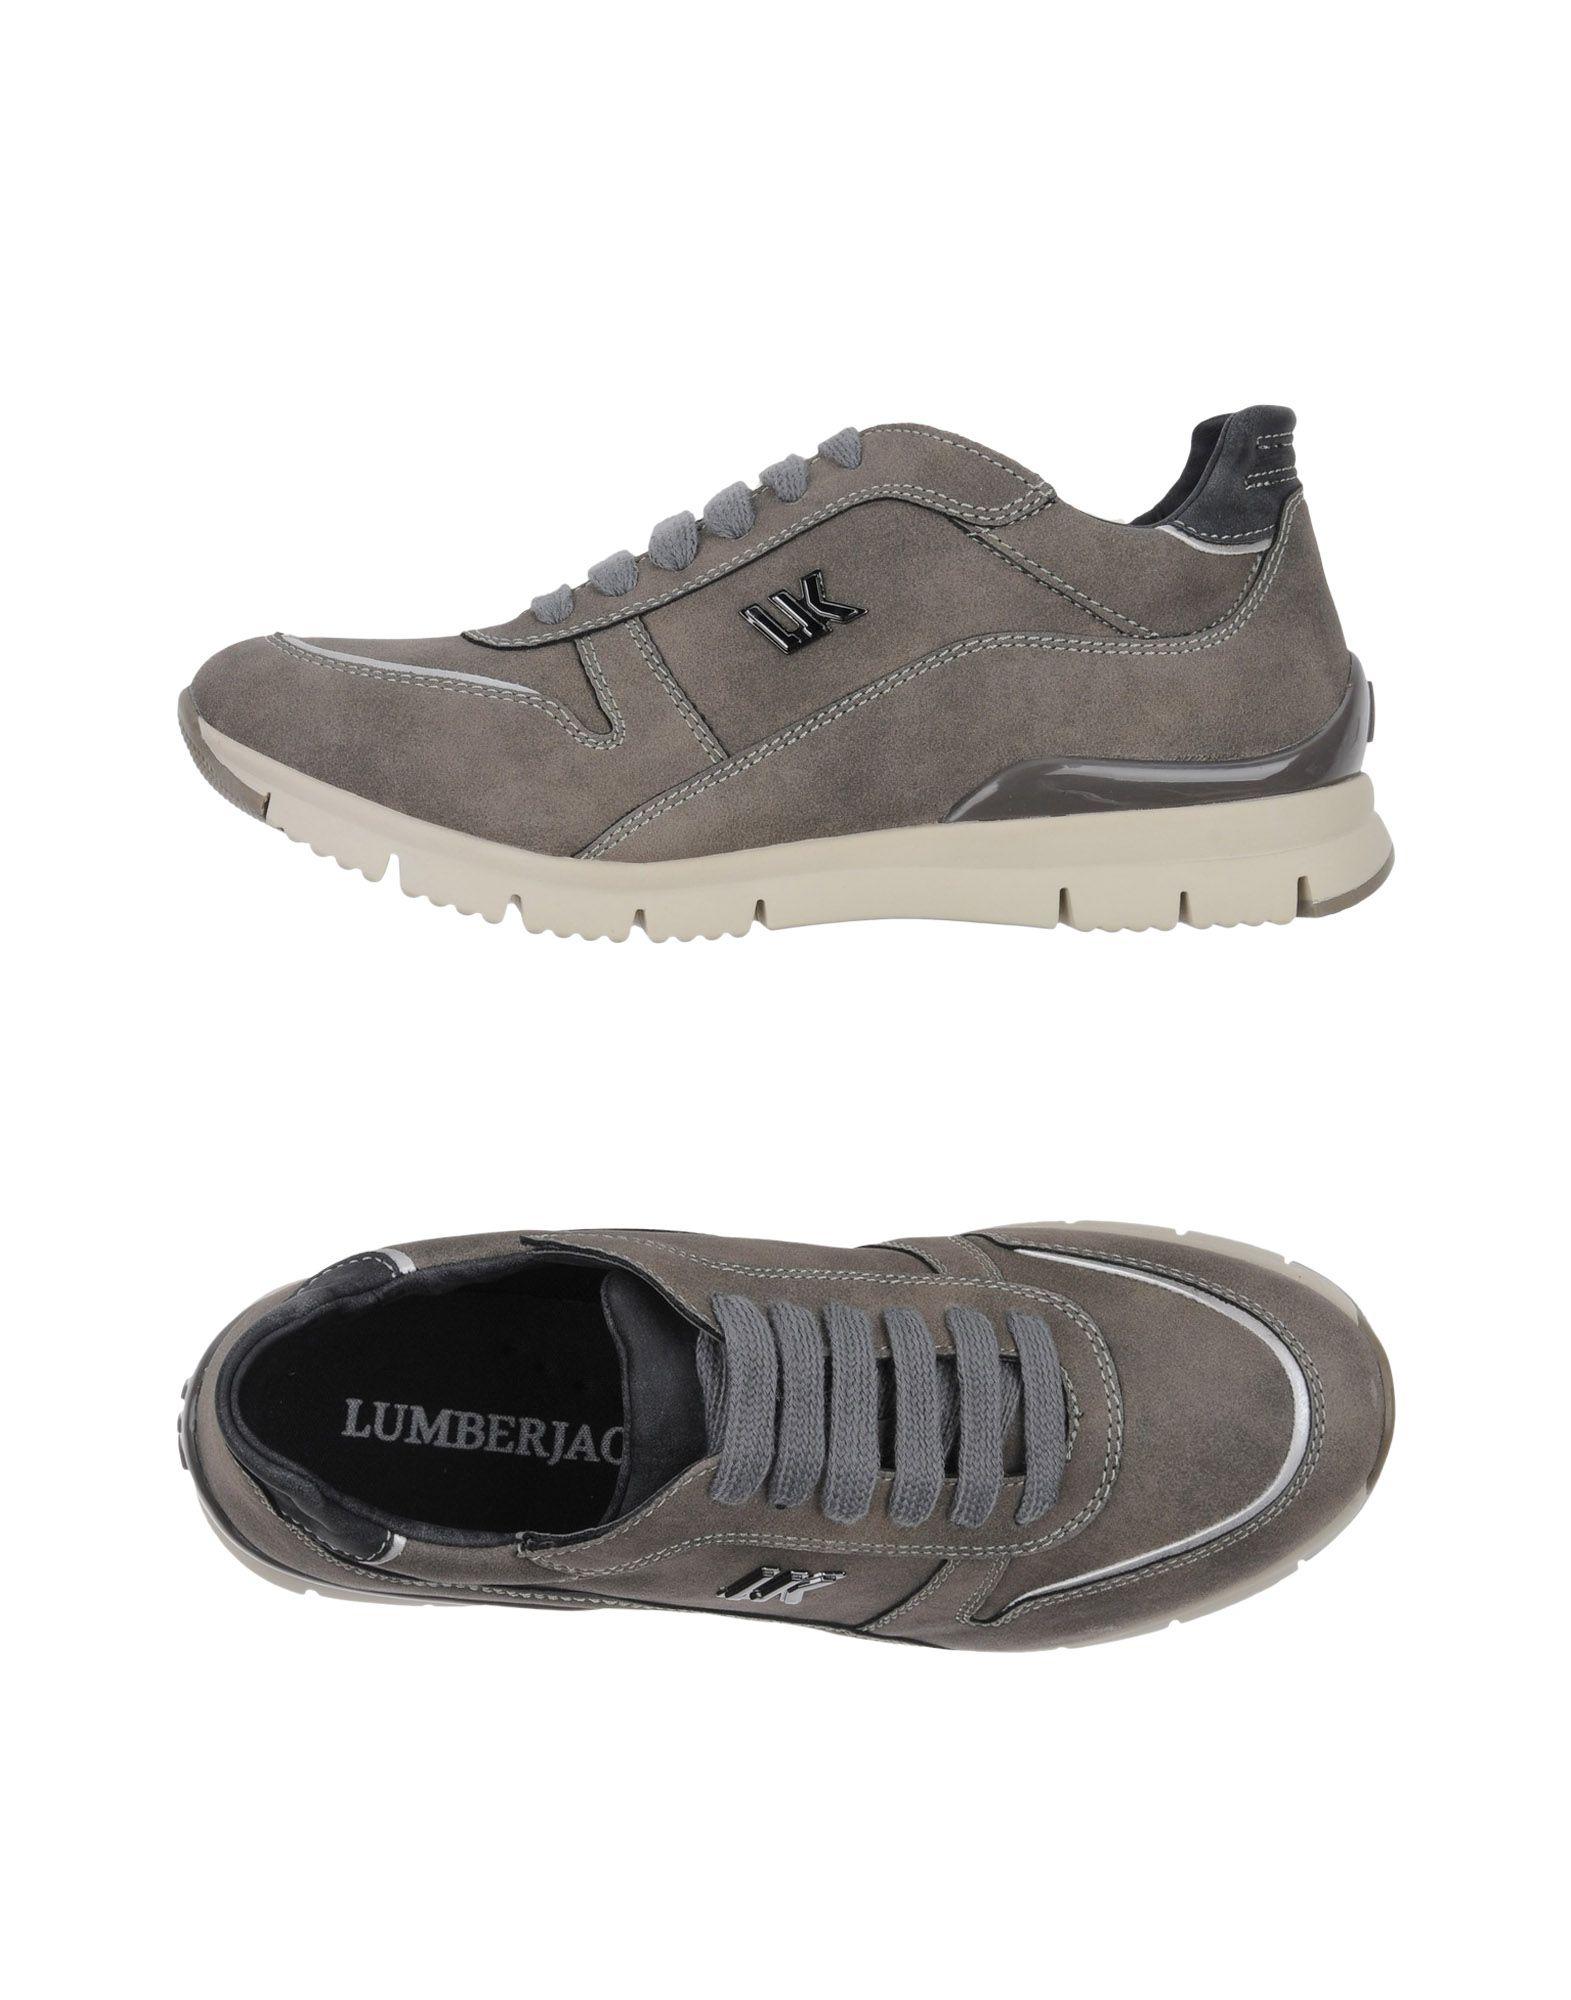 Moda Sneakers Lumberjack Donna Donna Lumberjack - 11288683WK e0e8df